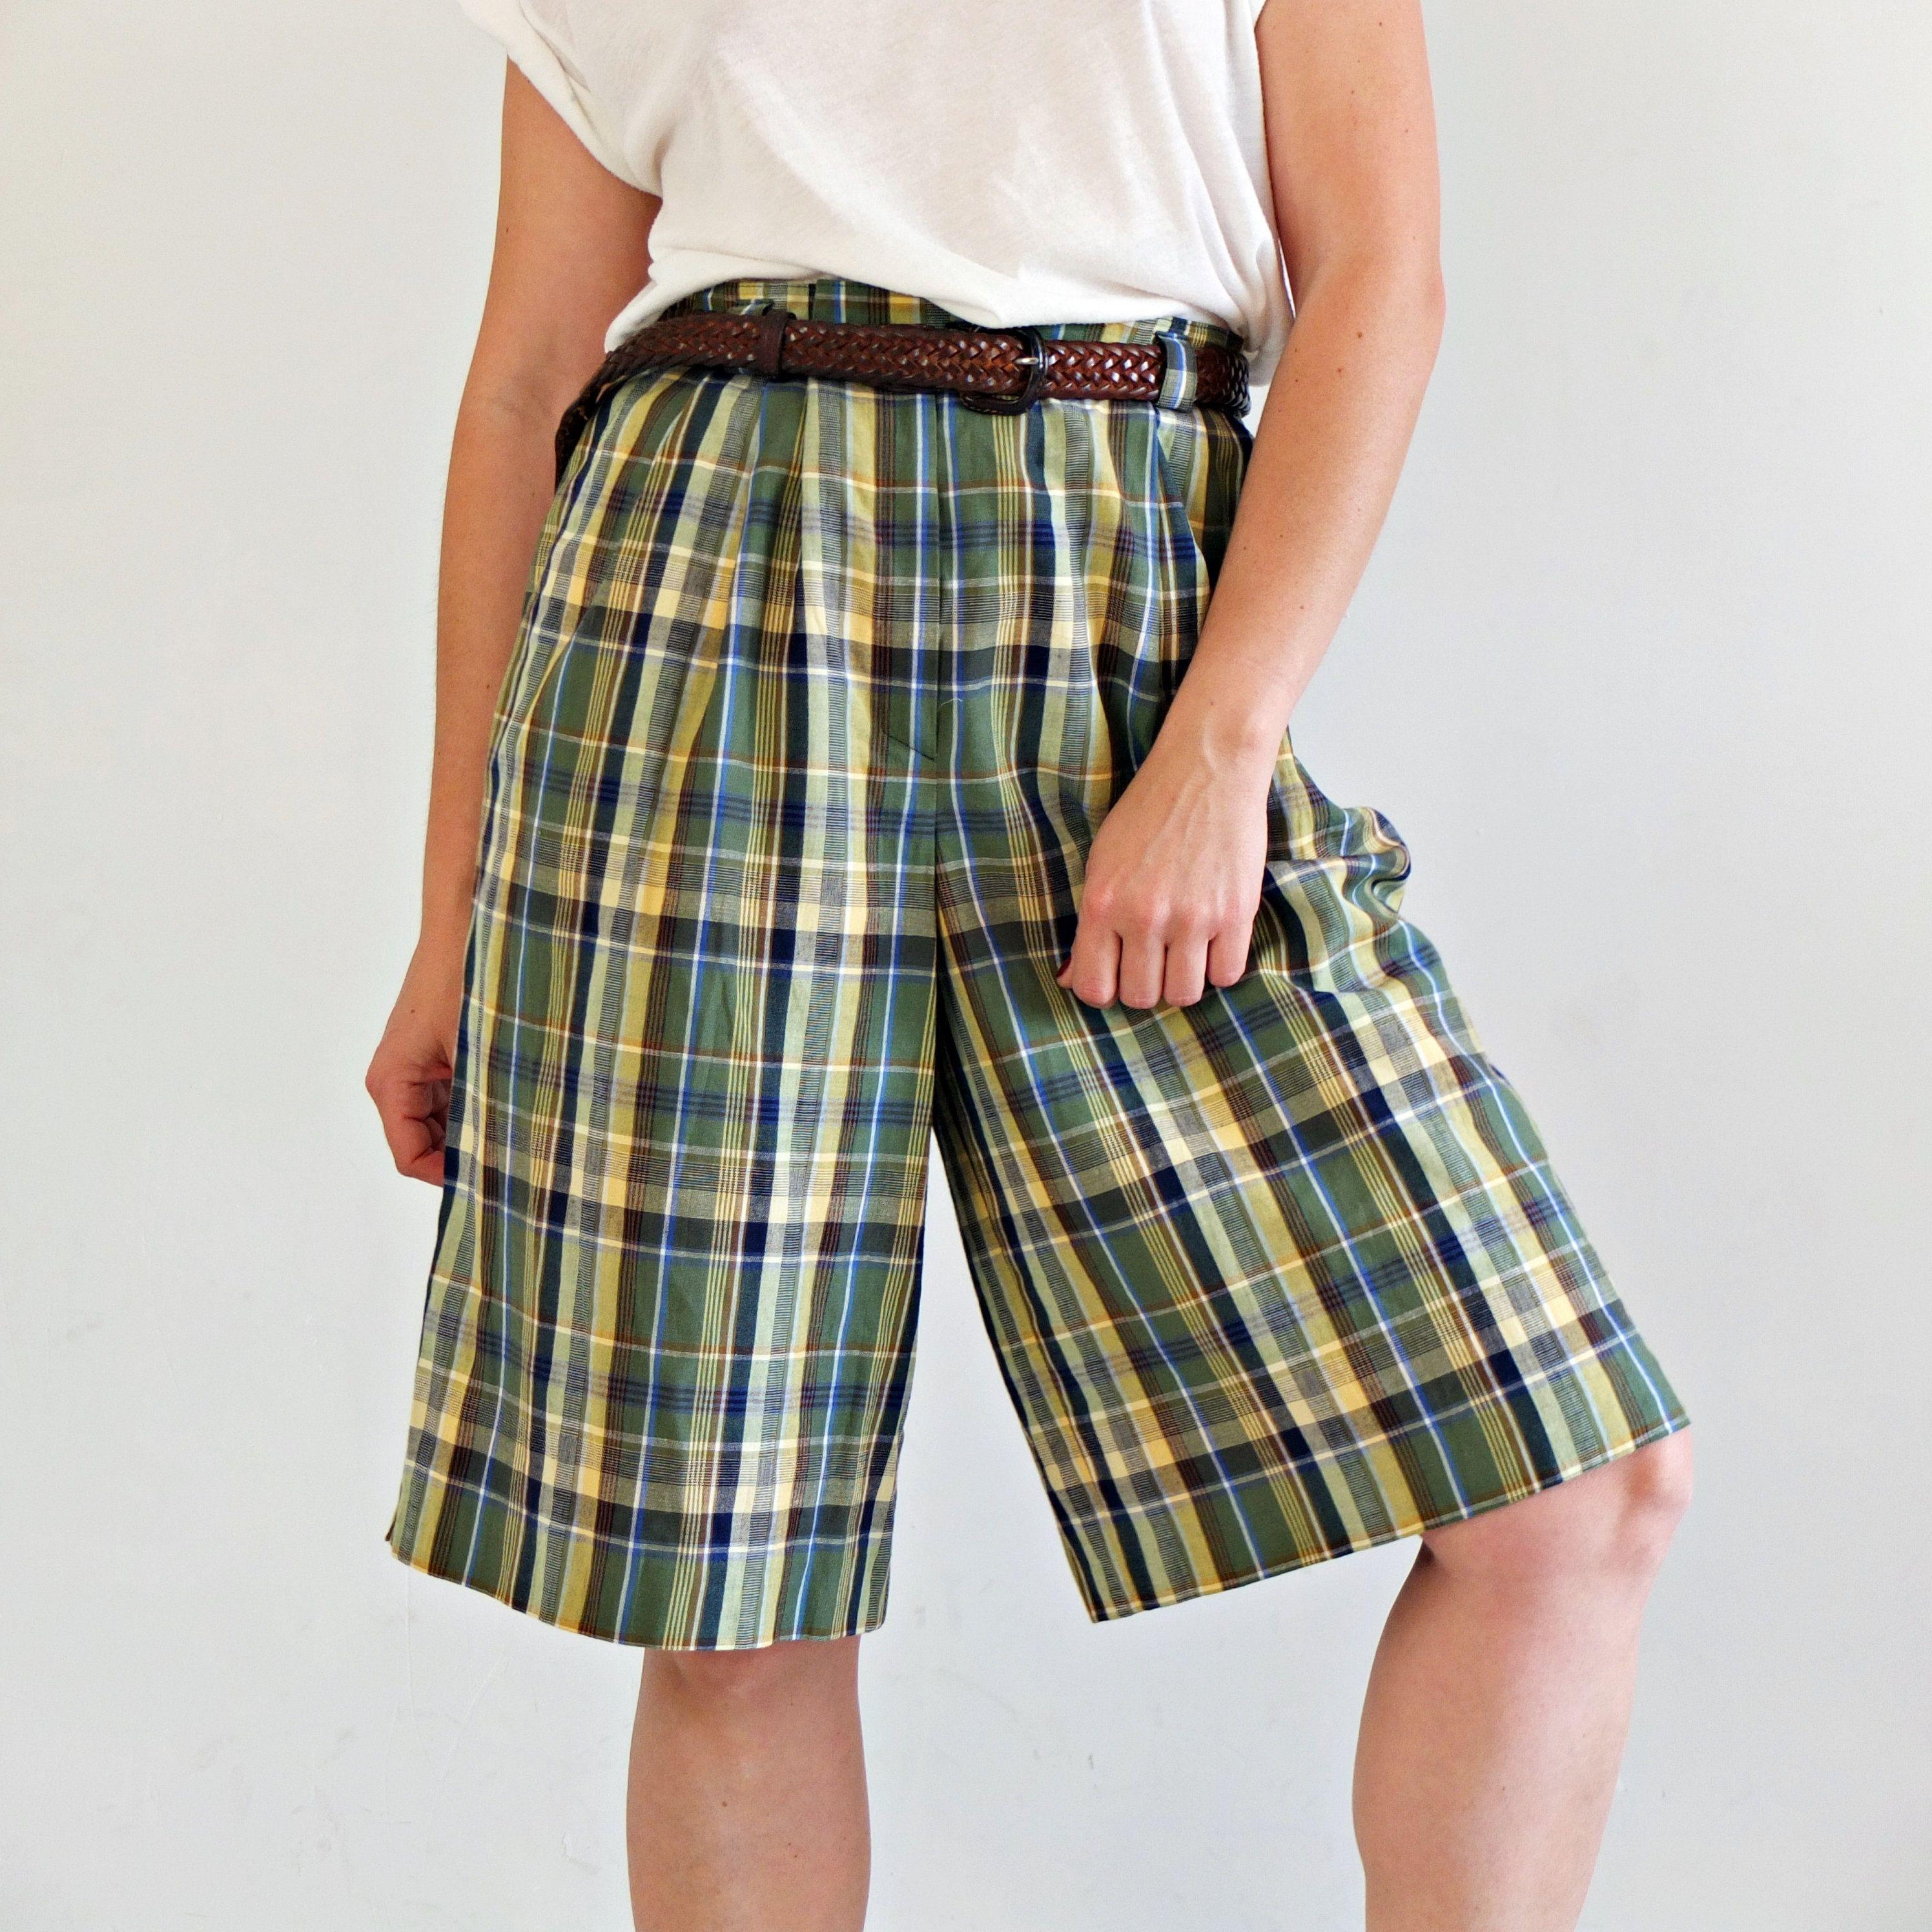 90s Gray Plaid Wide Leg Shorts 36-38 Waist Vintage High Waist Plaid Short Womens Plus Size 1X